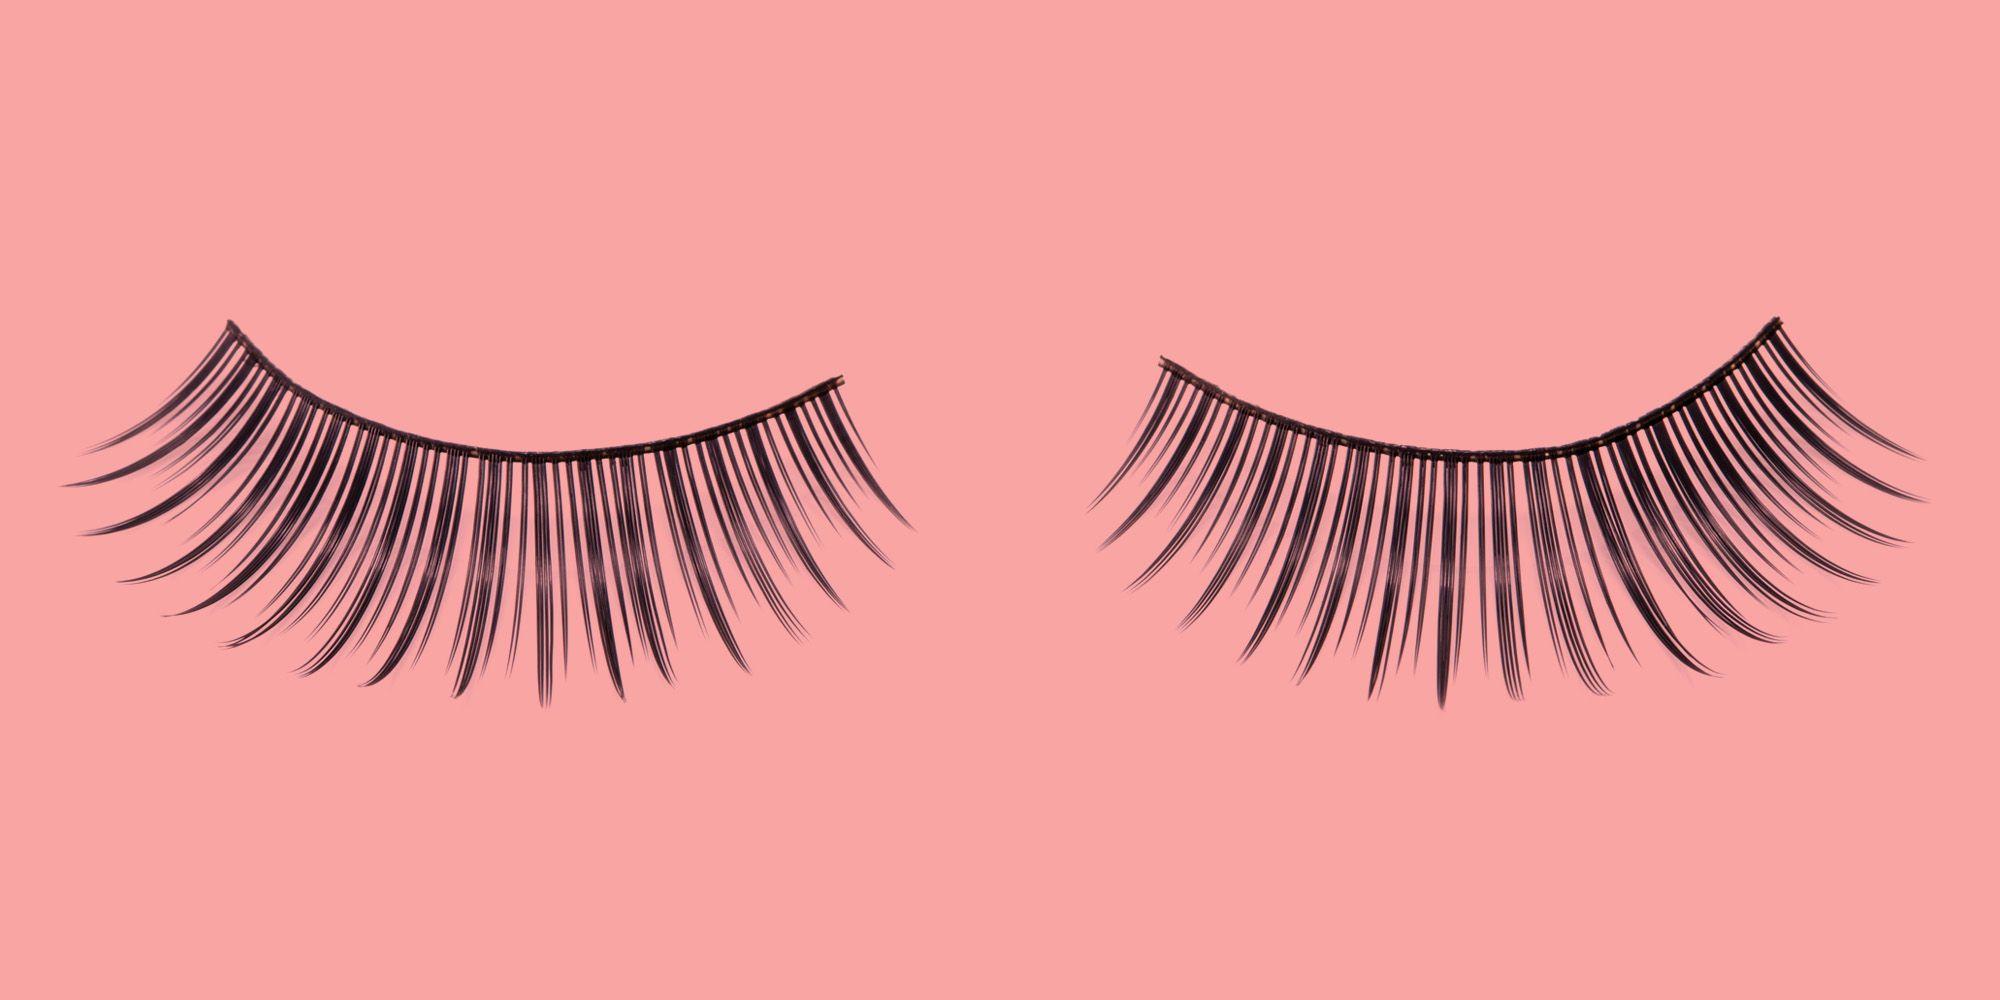 Fake Eyelashes How To Apply Fake Eyelashes Step By Step